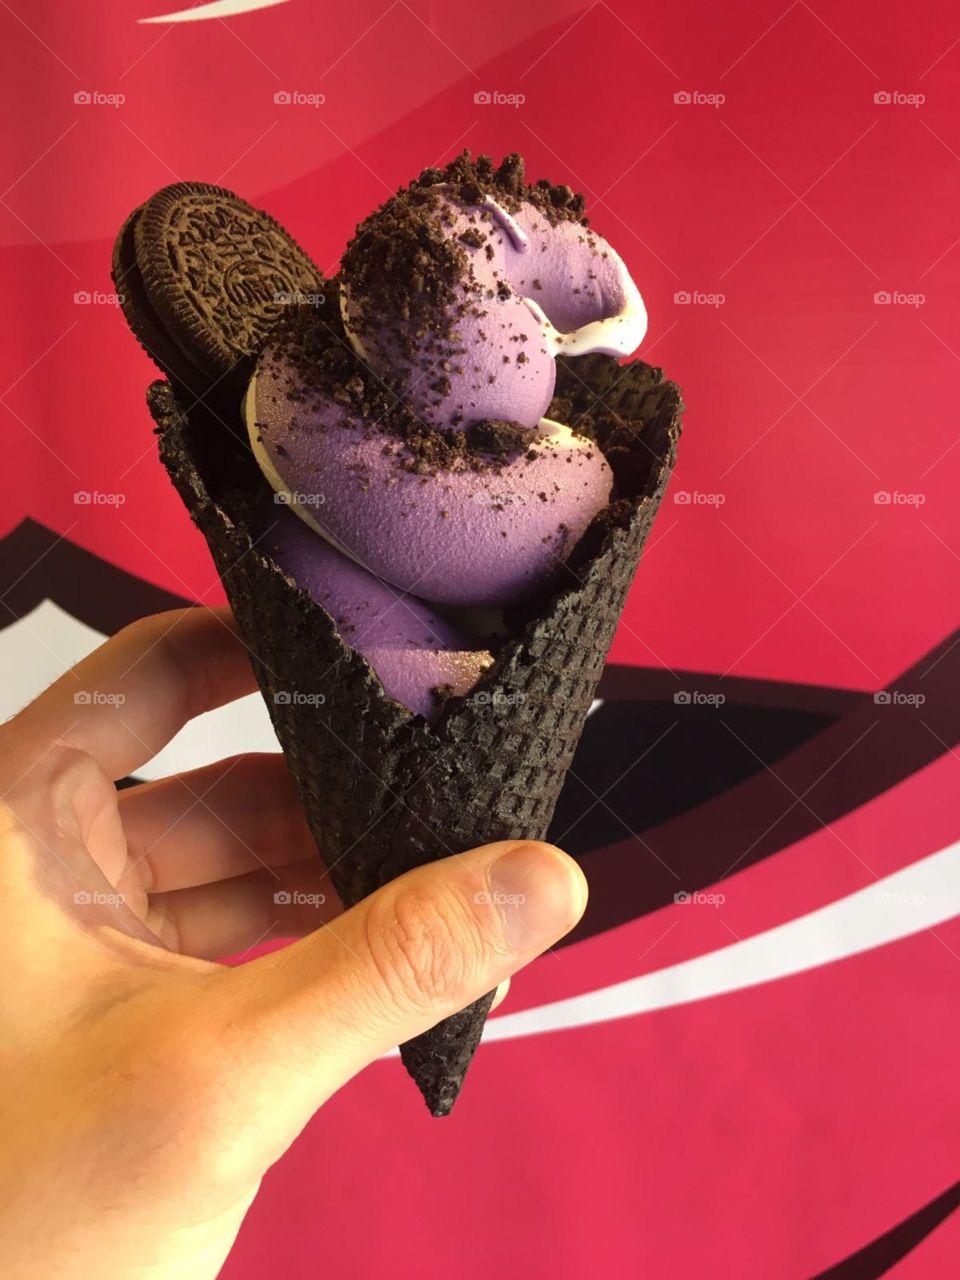 Oreo Cookie Ice Cream Cone